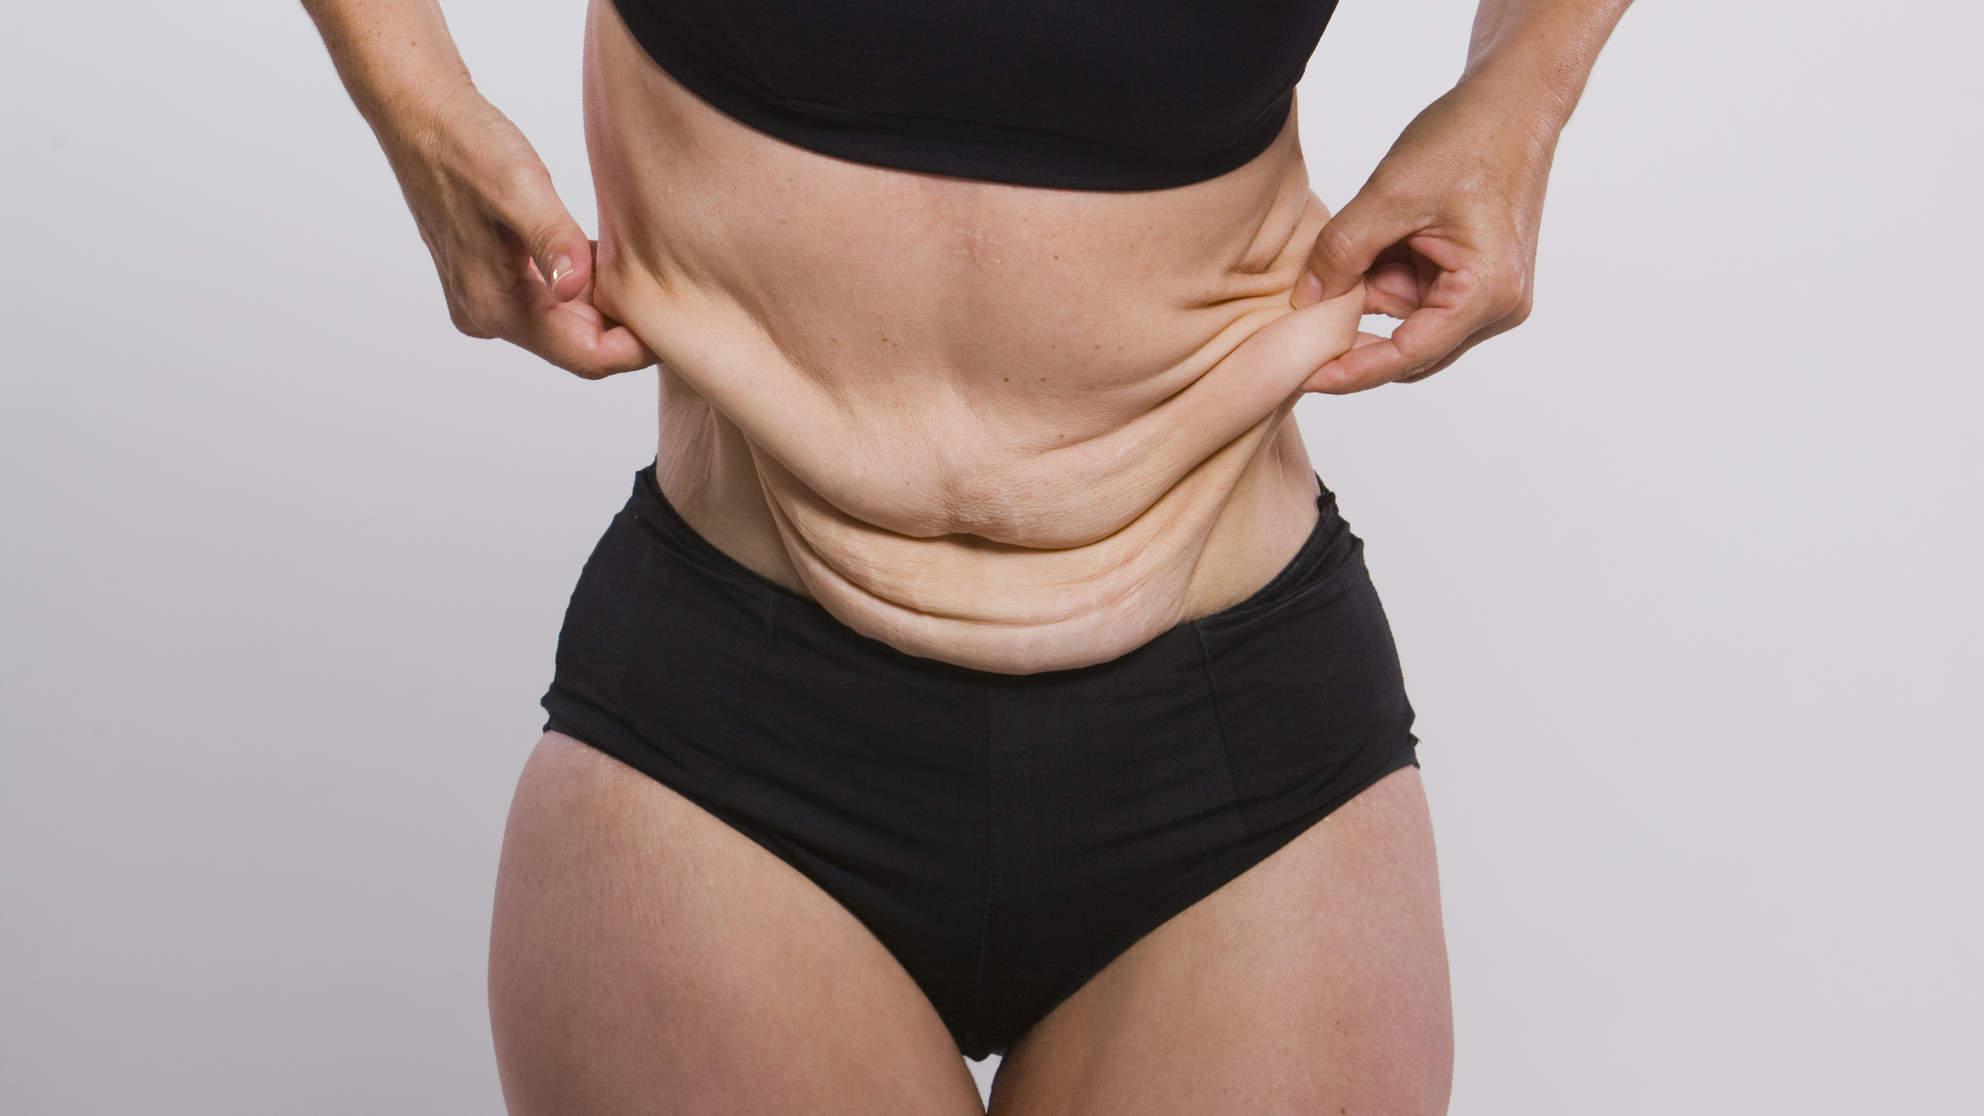 kiire ja tervislik viis rasva poletamiseks de salendav